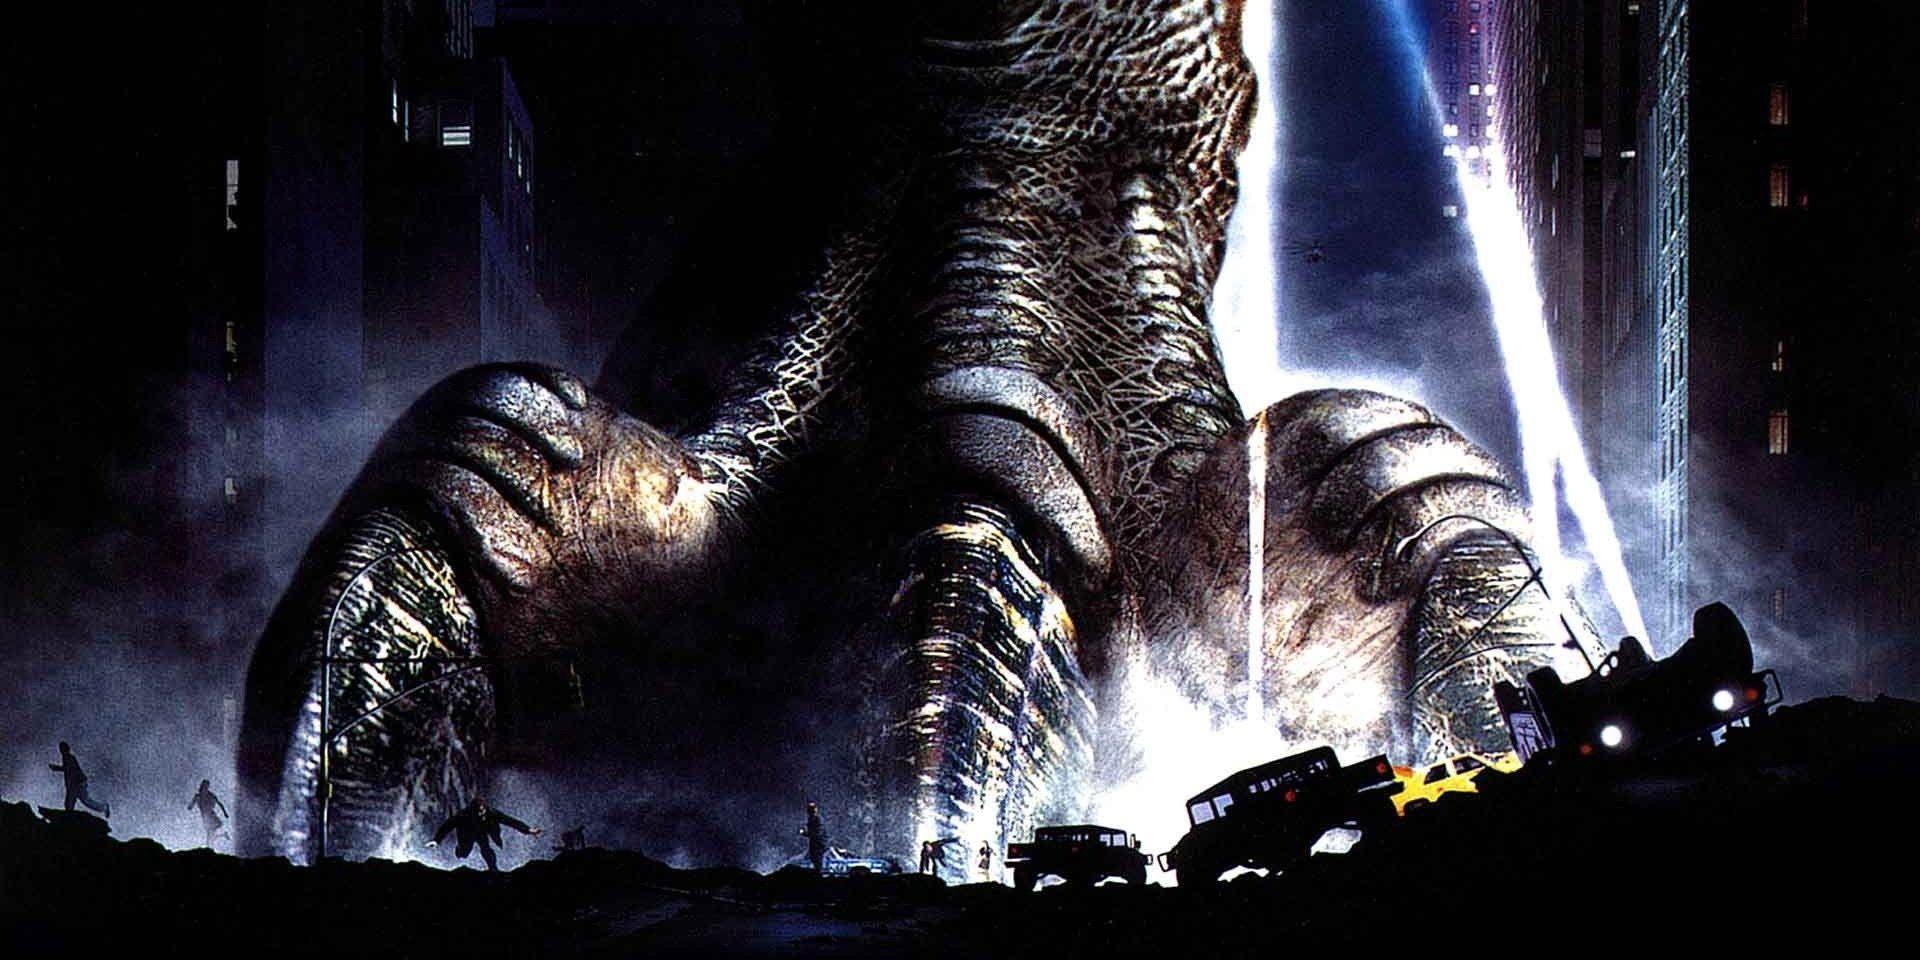 TV and Movie News Godzilla: The 5 Best Movies According To